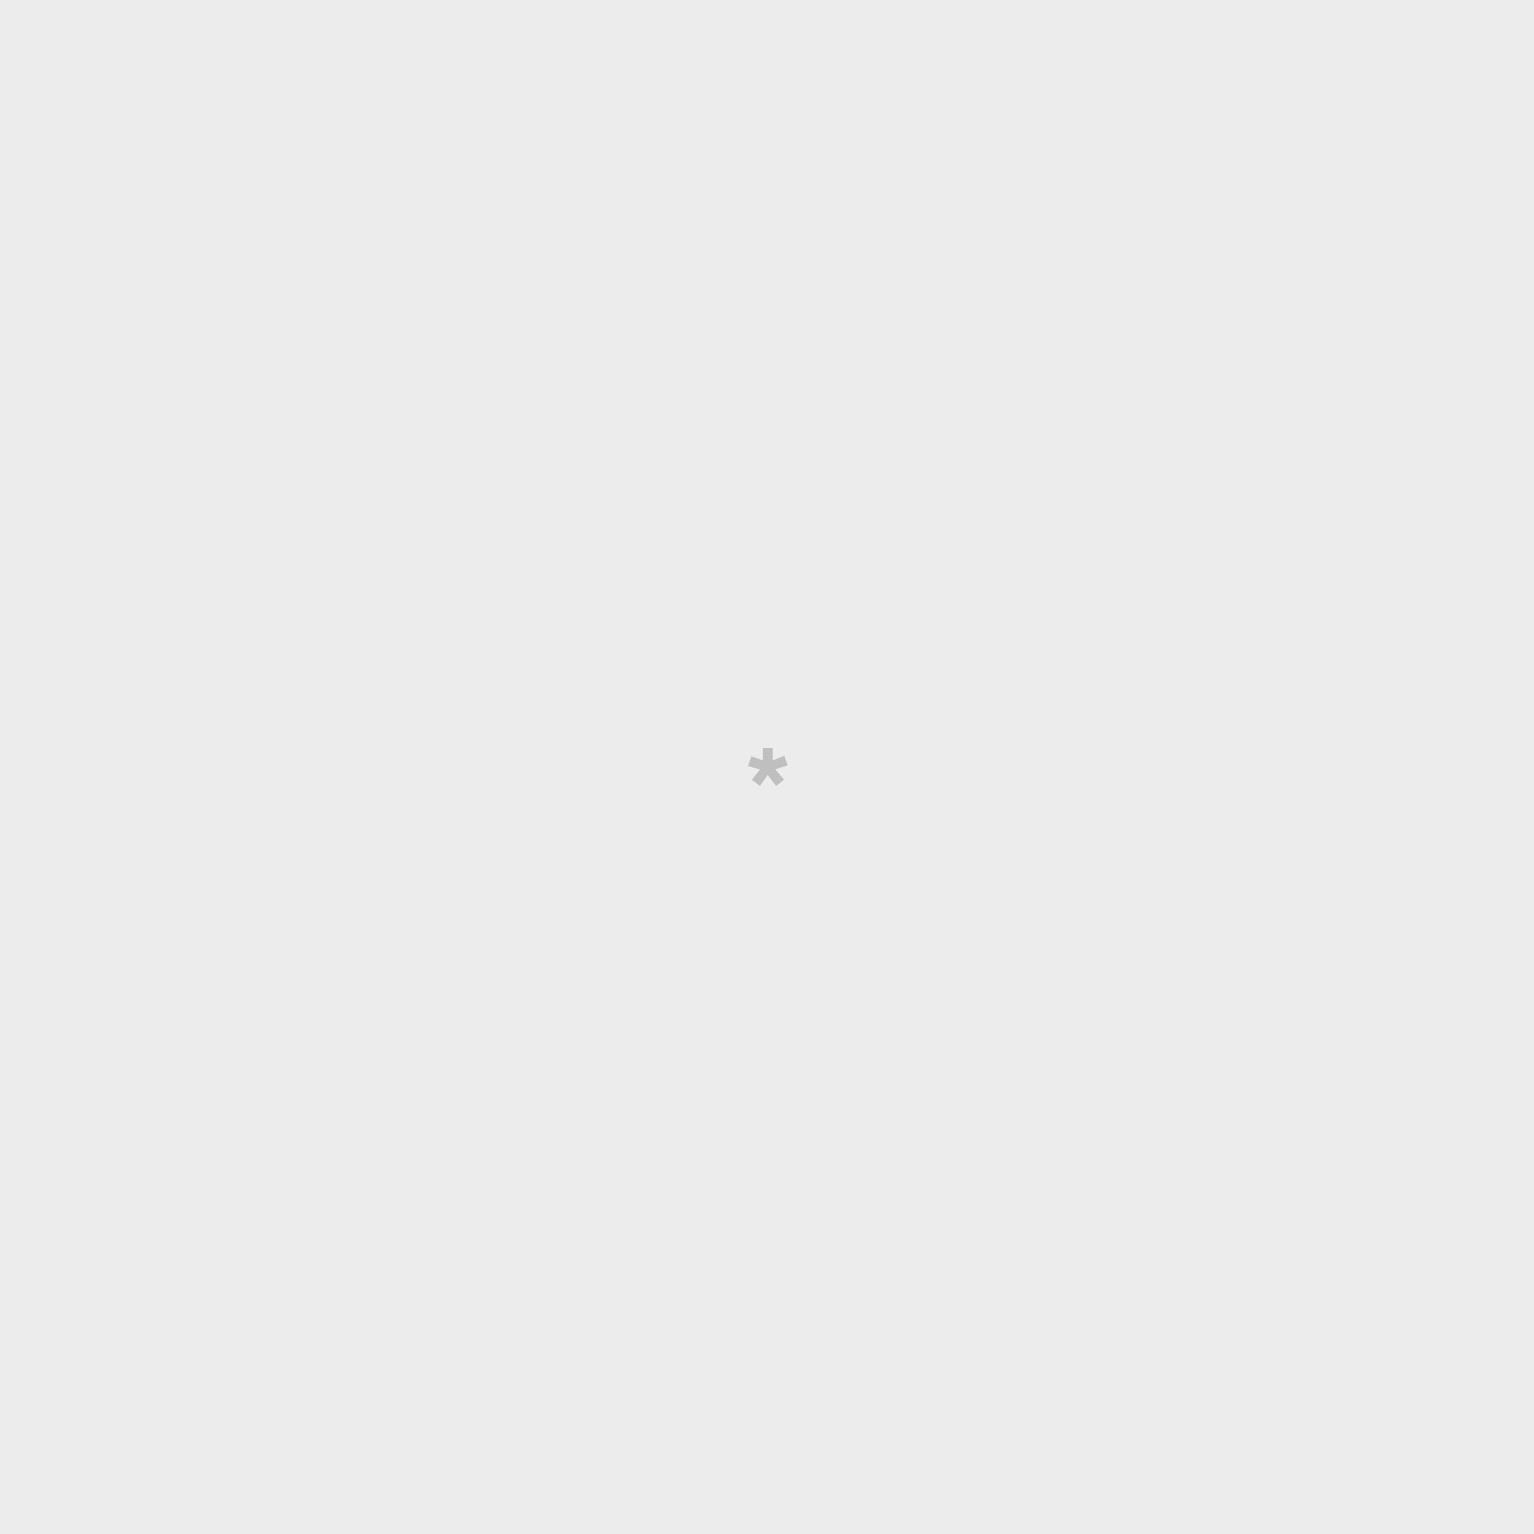 Bougie - Avec toi, je fonds  Blackberry Ice Cream